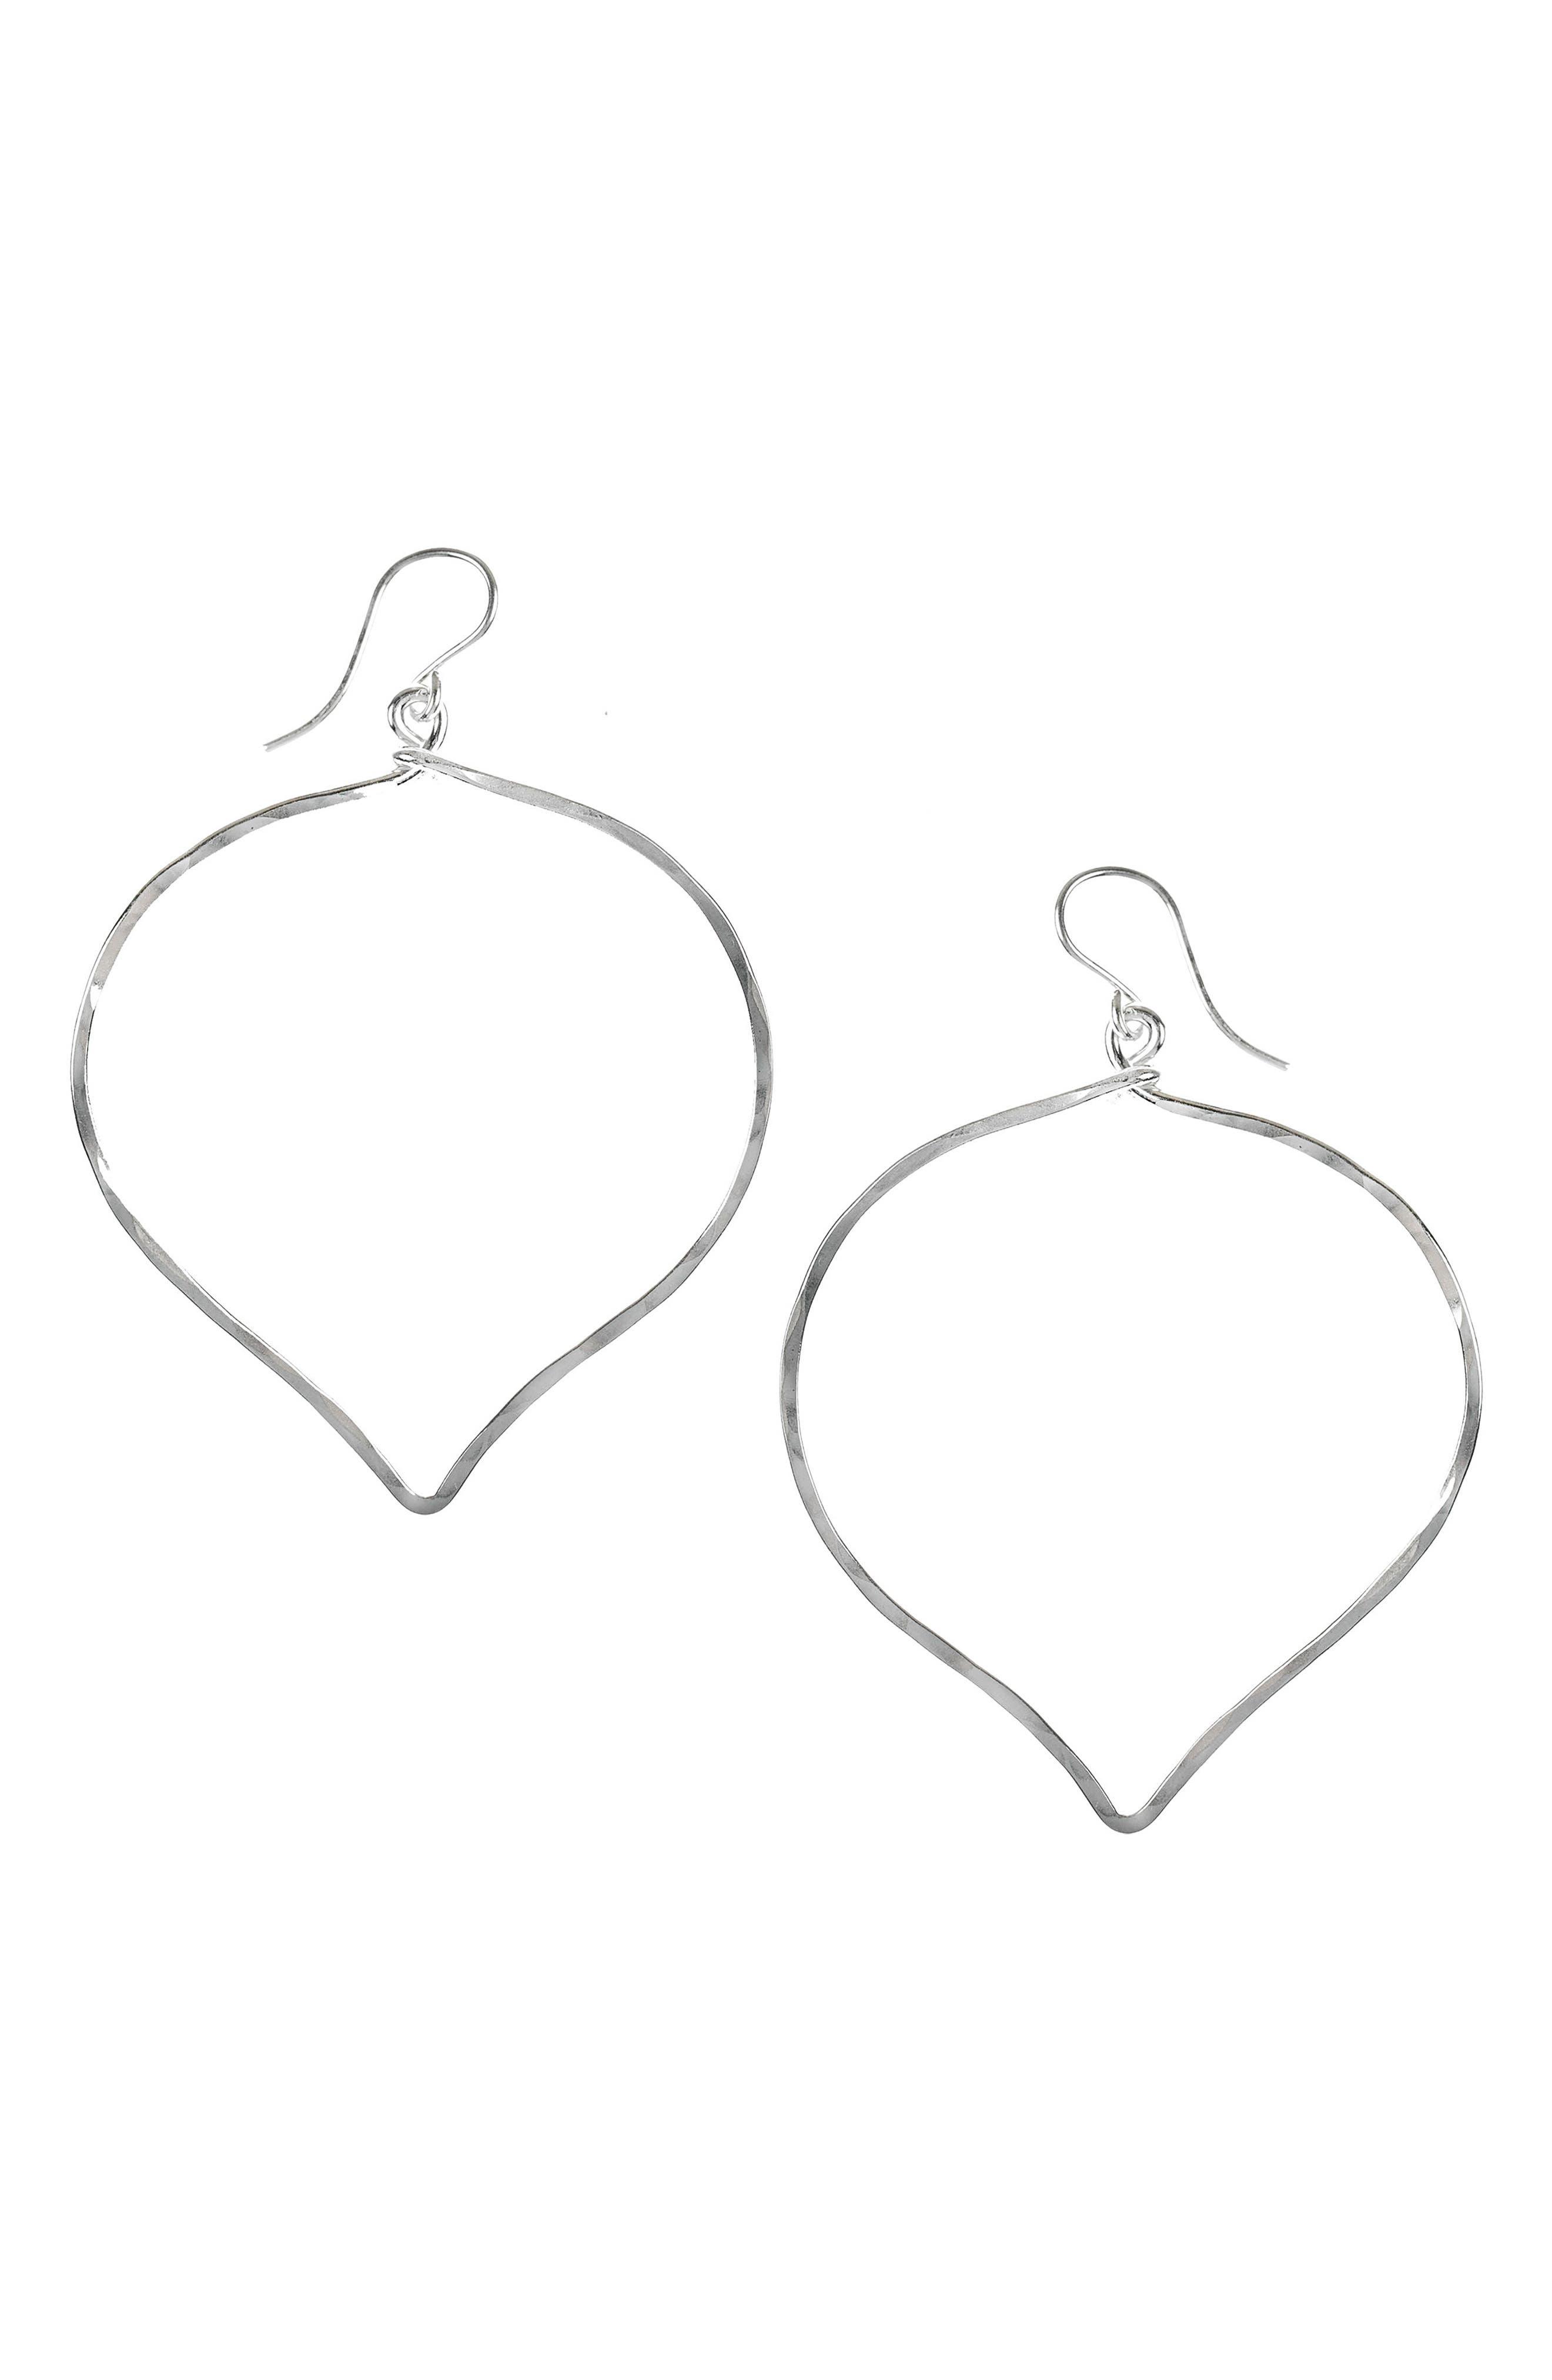 Ija 'Large' Faceted Lotus Hoop Earrings,                             Main thumbnail 1, color,                             040